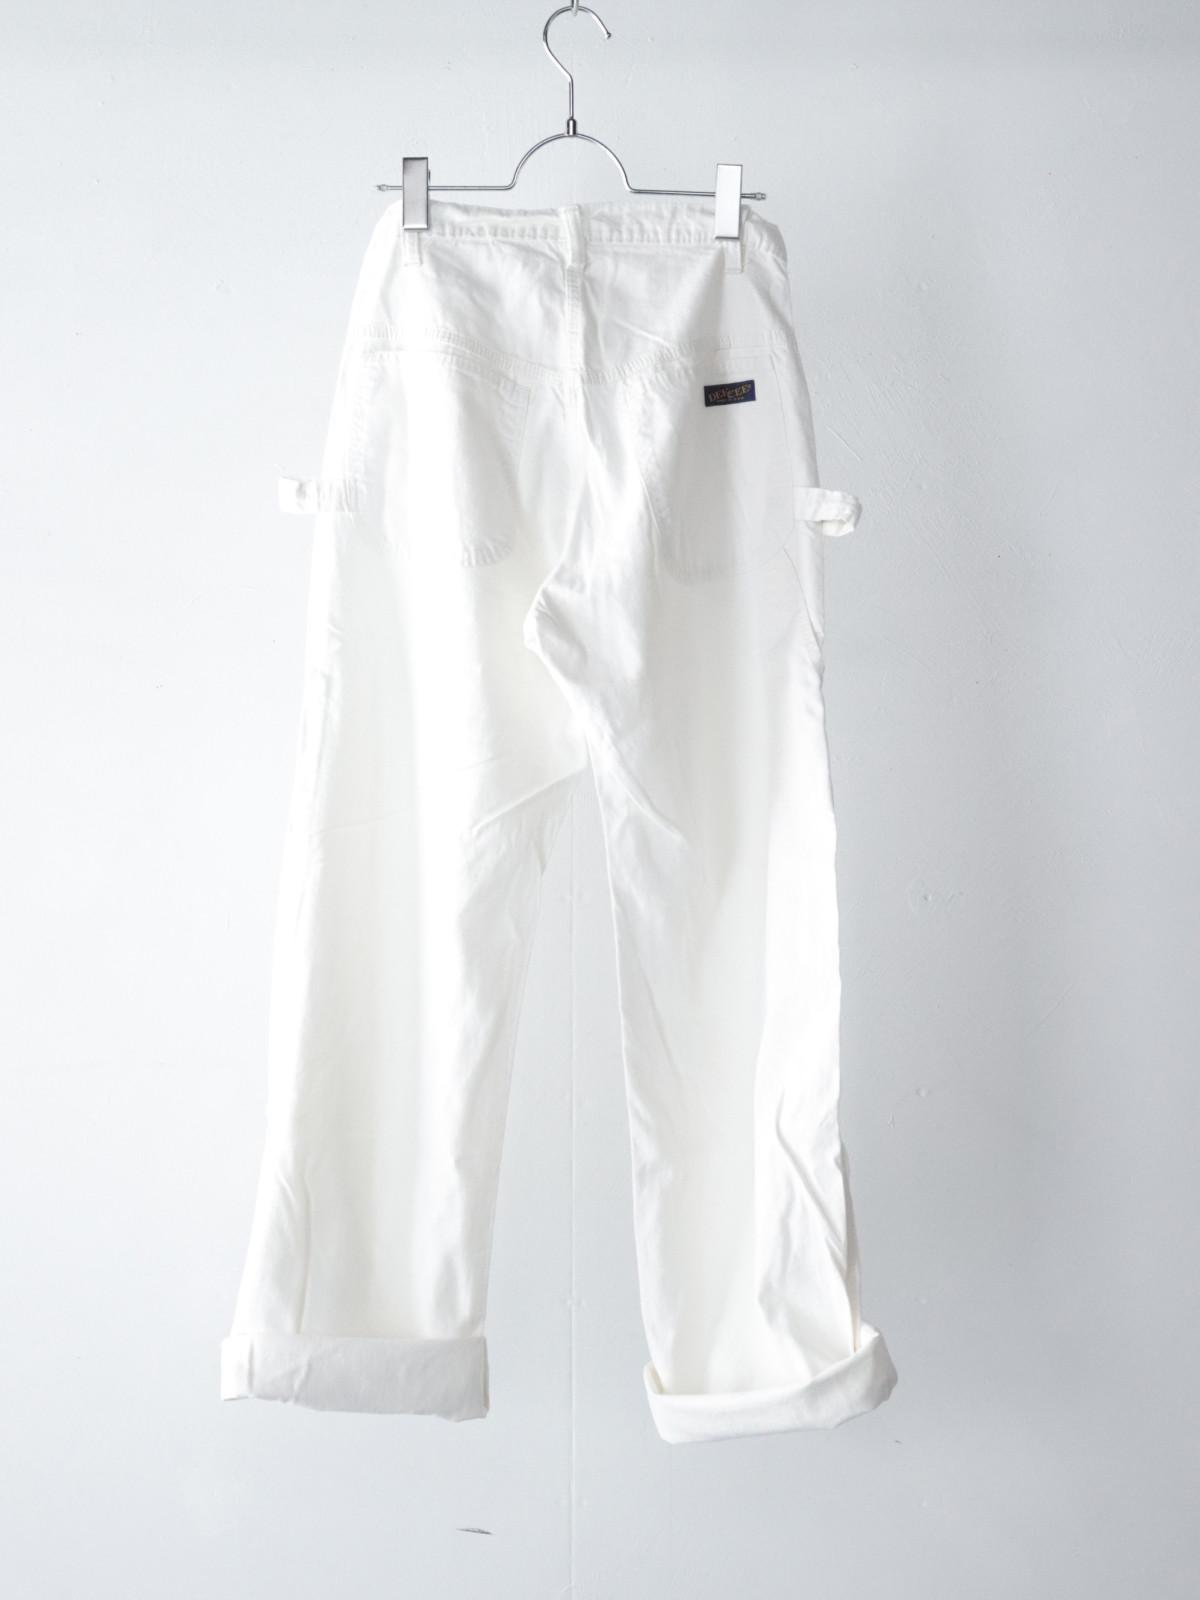 DEECEE,painter pants,USA